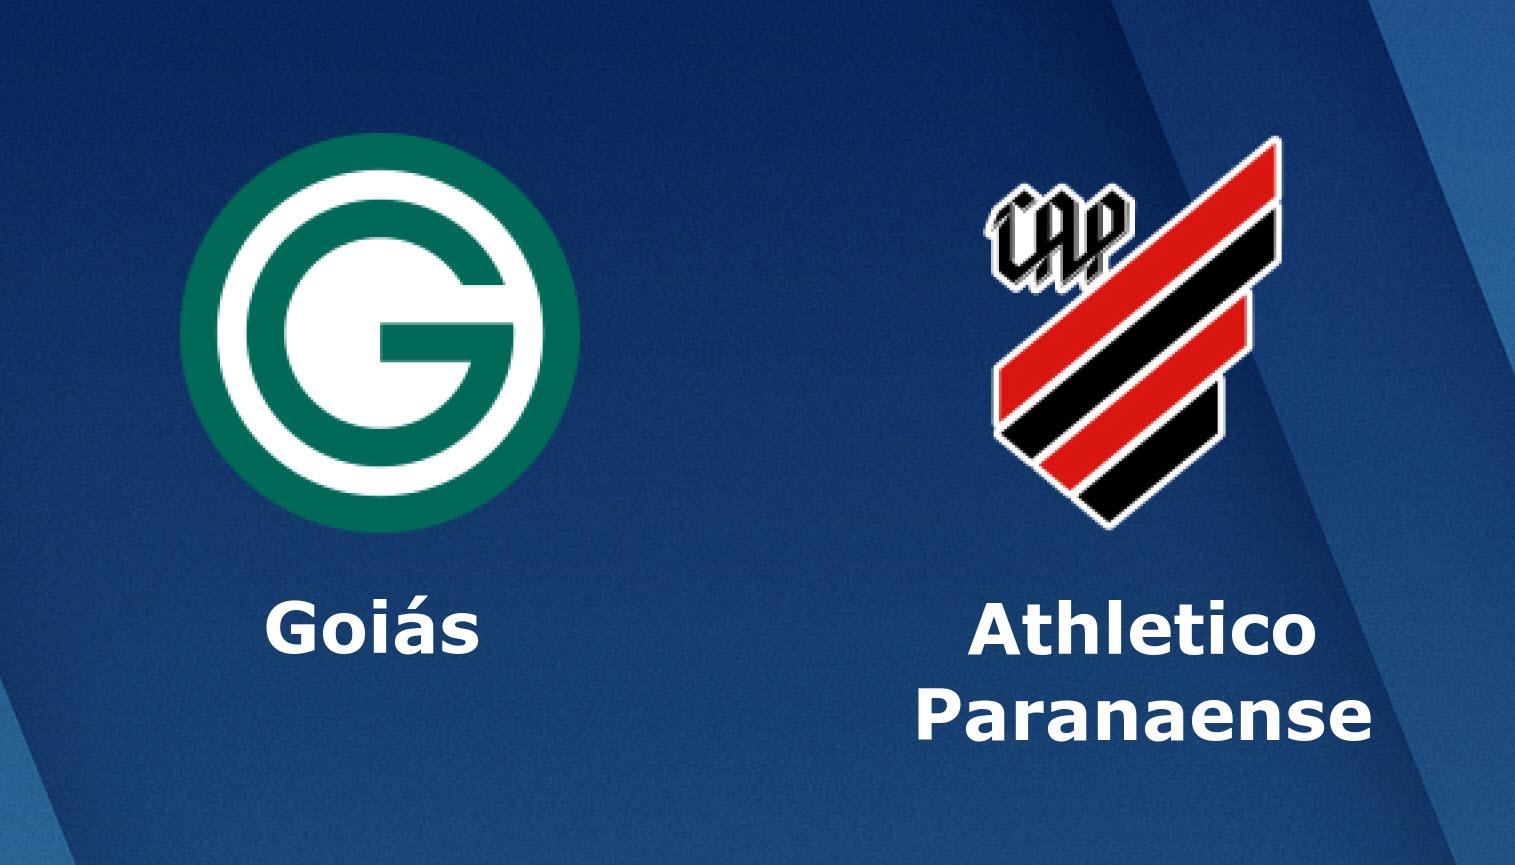 goias-vs-athletico-paranaense-06h00-ngay-14-06